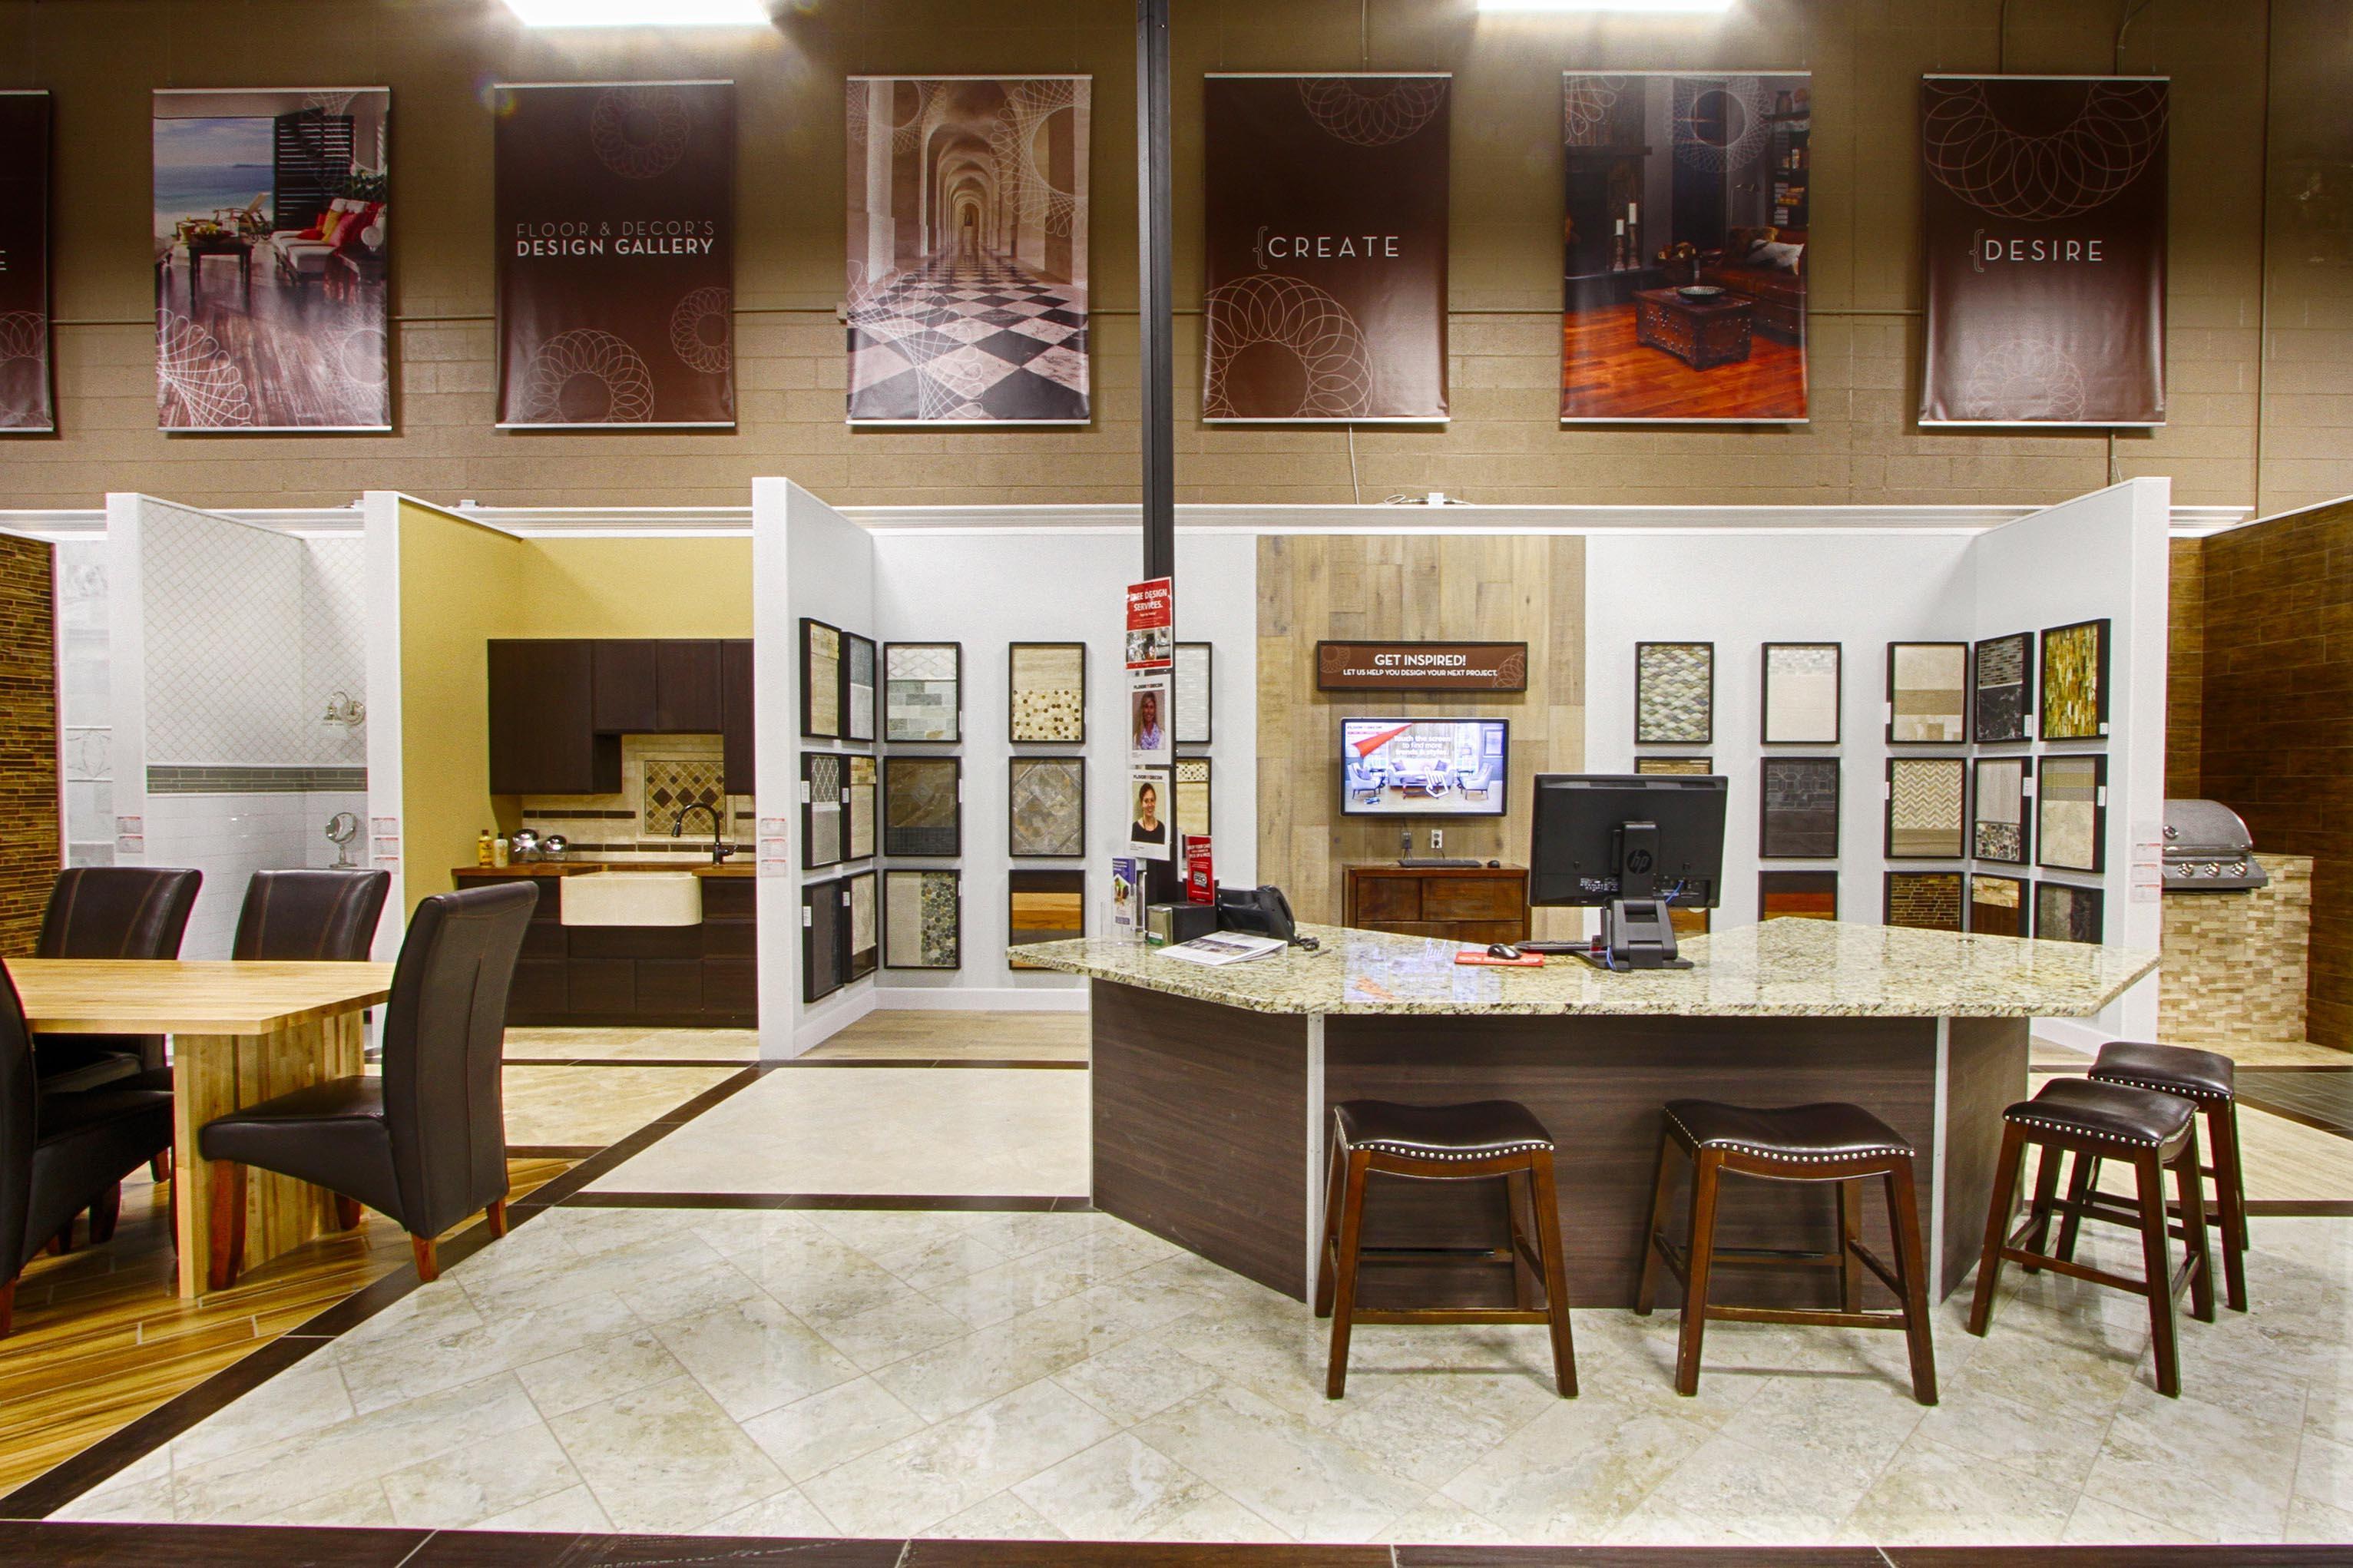 Floor & Decor 4 Bridford Parkway Greensboro, NC Flooring - MapQuest